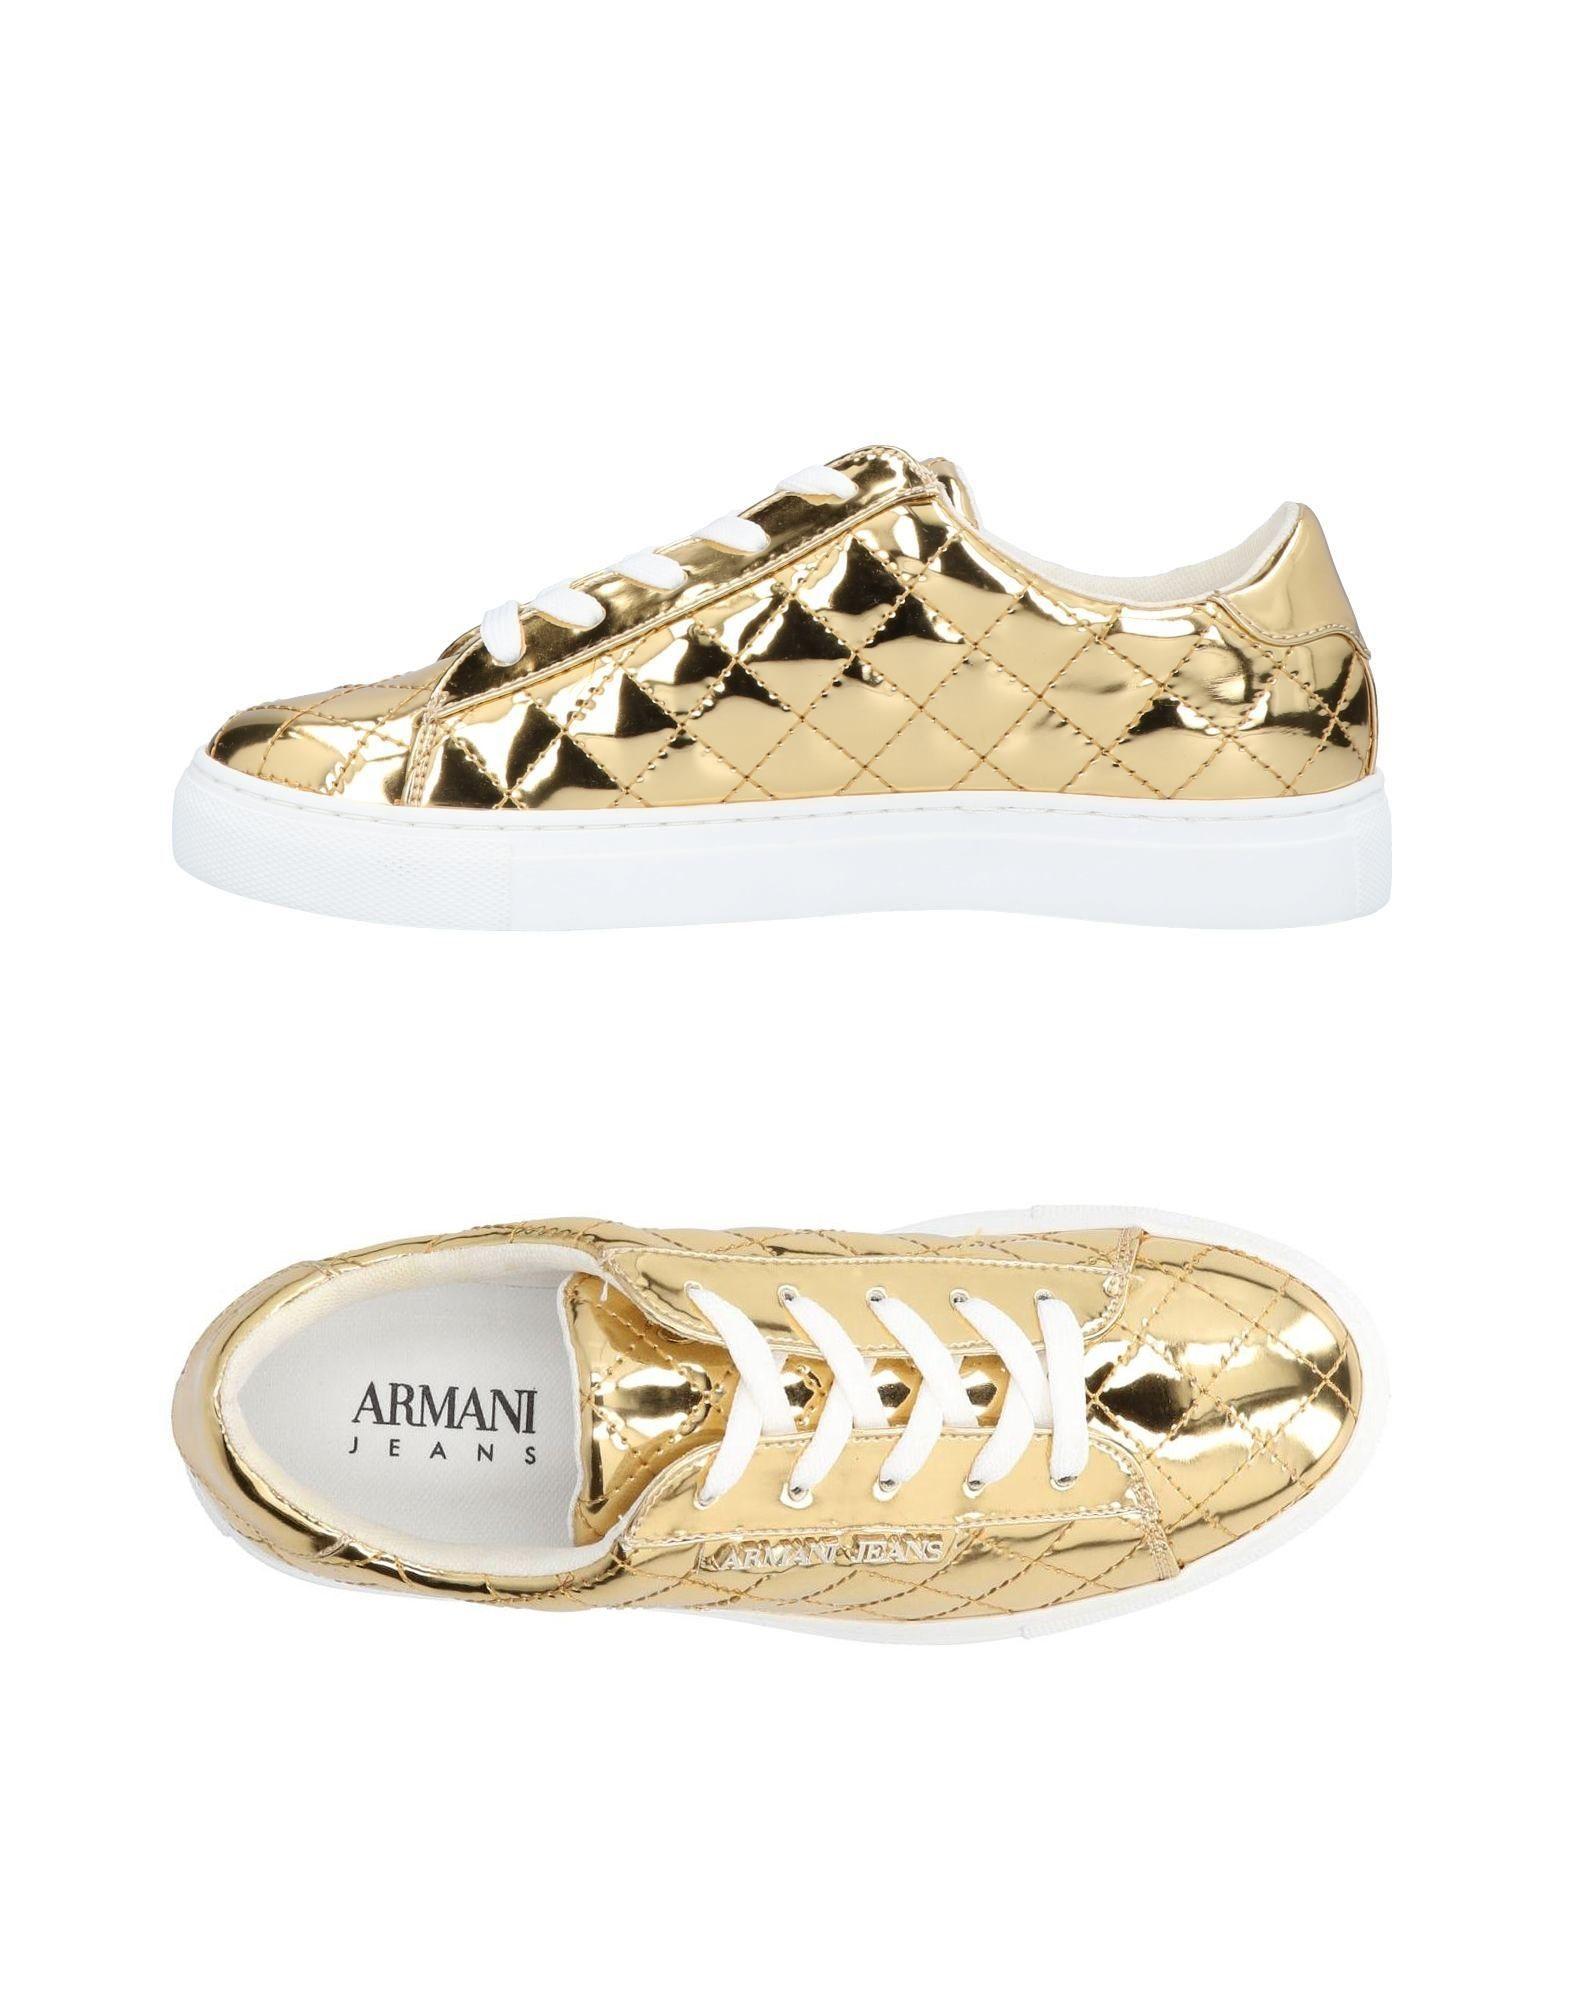 ARMANI JEANS Низкие кеды и кроссовки кроссовки armani jeans armani jeans ar411awpwc90